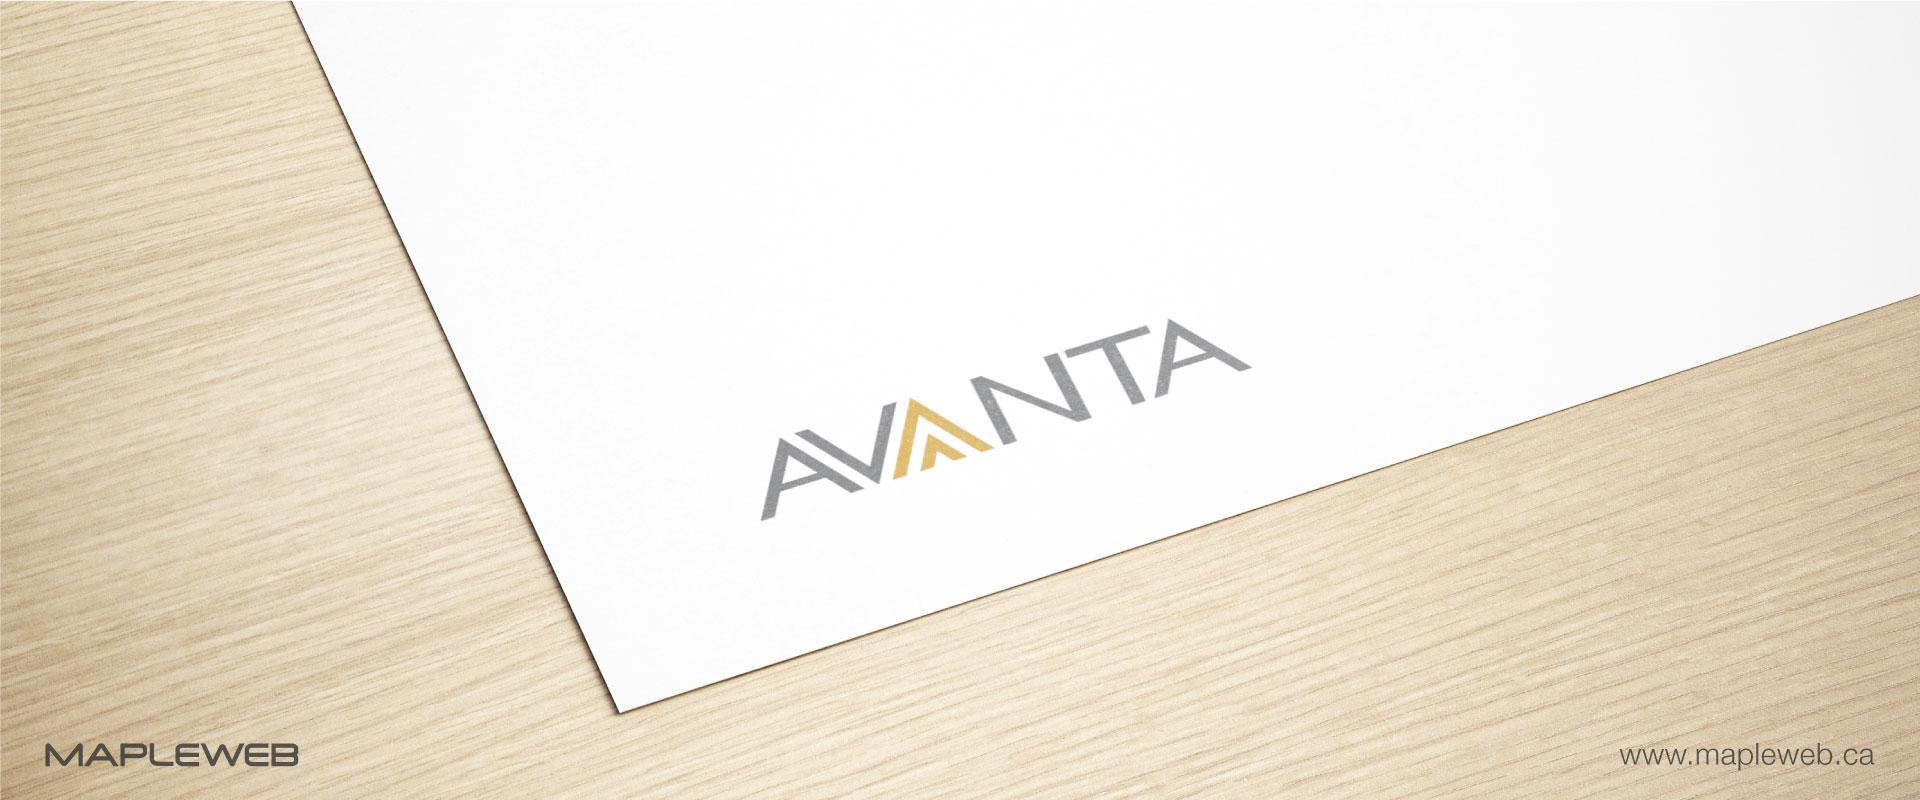 avanta-brand-logo-design-by-mapleweb-vancouver-canada-paper-mock